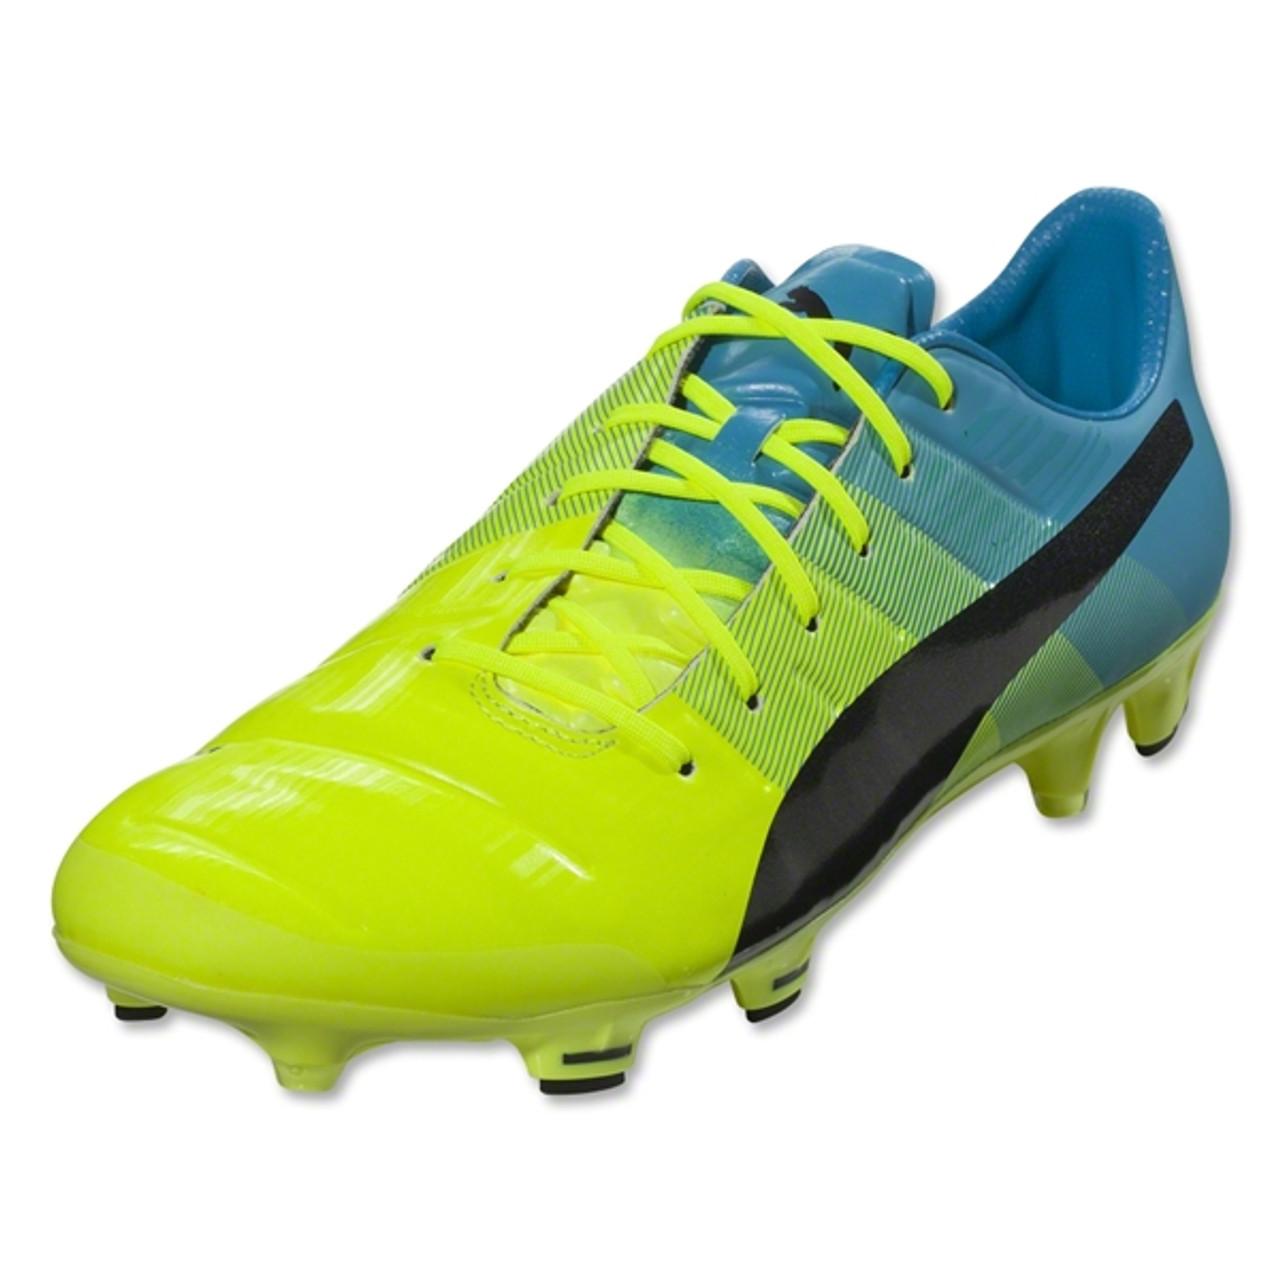 Puma Evopower 1.3 FG - Yellow Blue - Soccer City 14e86a7bc4